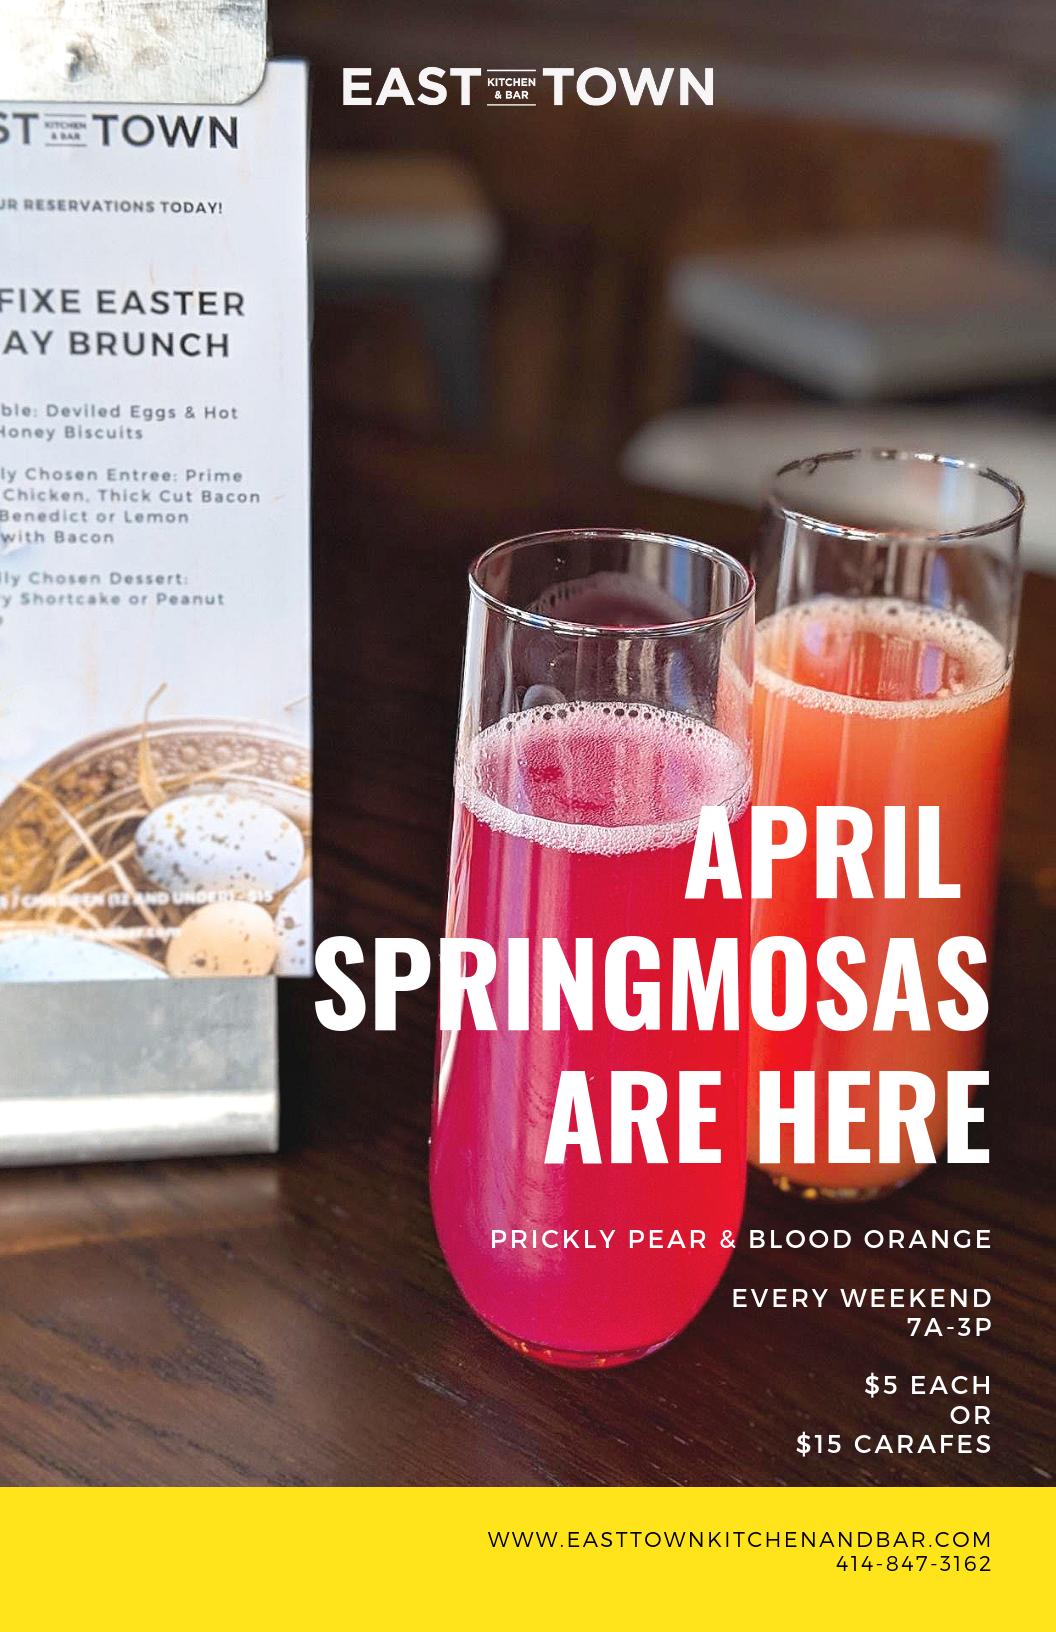 aprilbrunch-spring-mimosas.png